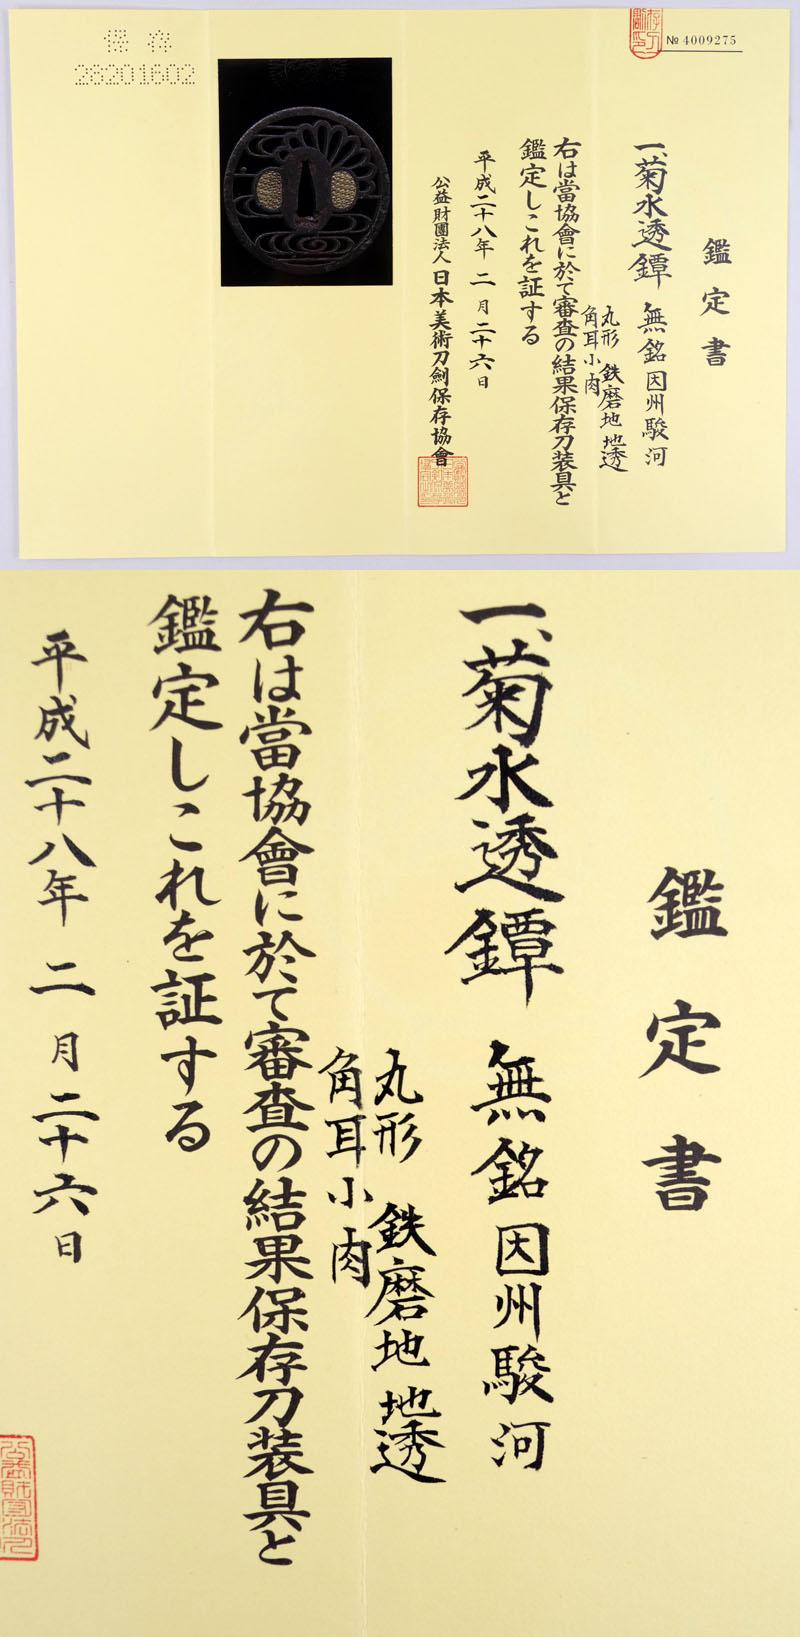 菊水透鍔 無銘 因州駿河 Picture of Certificate